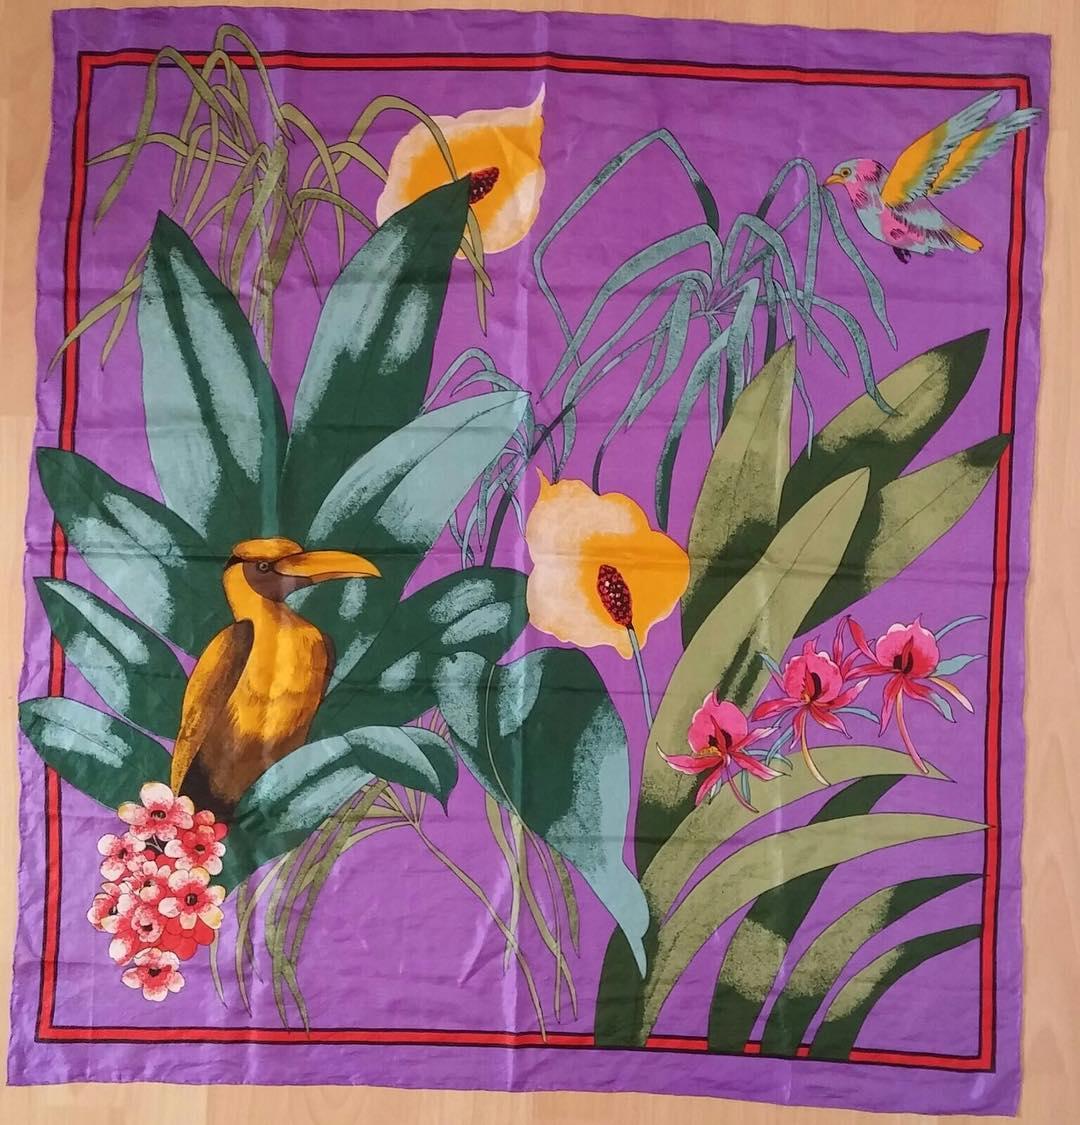 Silk scarf print tropicalprint springbreak vividcolours tropical silkscarf silkscarfsquare ilovetropicalprintshellip